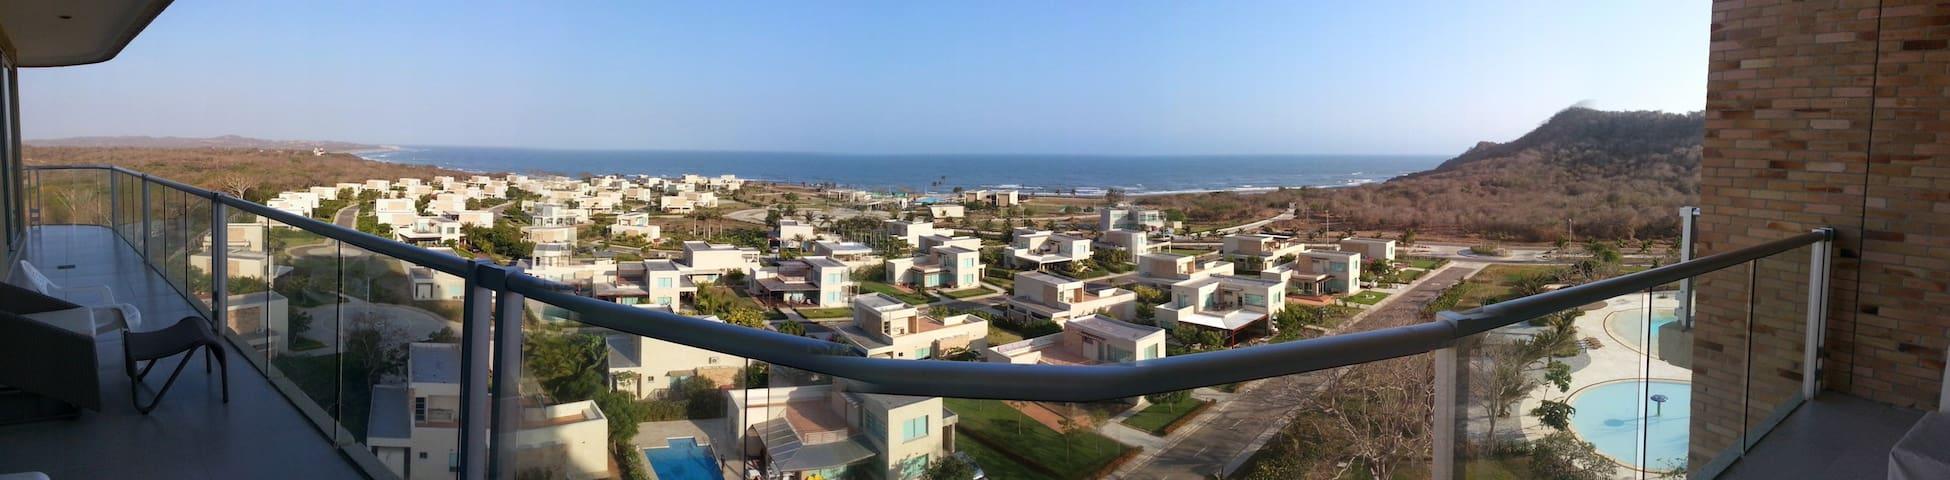 Bello apartamento junto al Mar - Atlantico - Apartmen